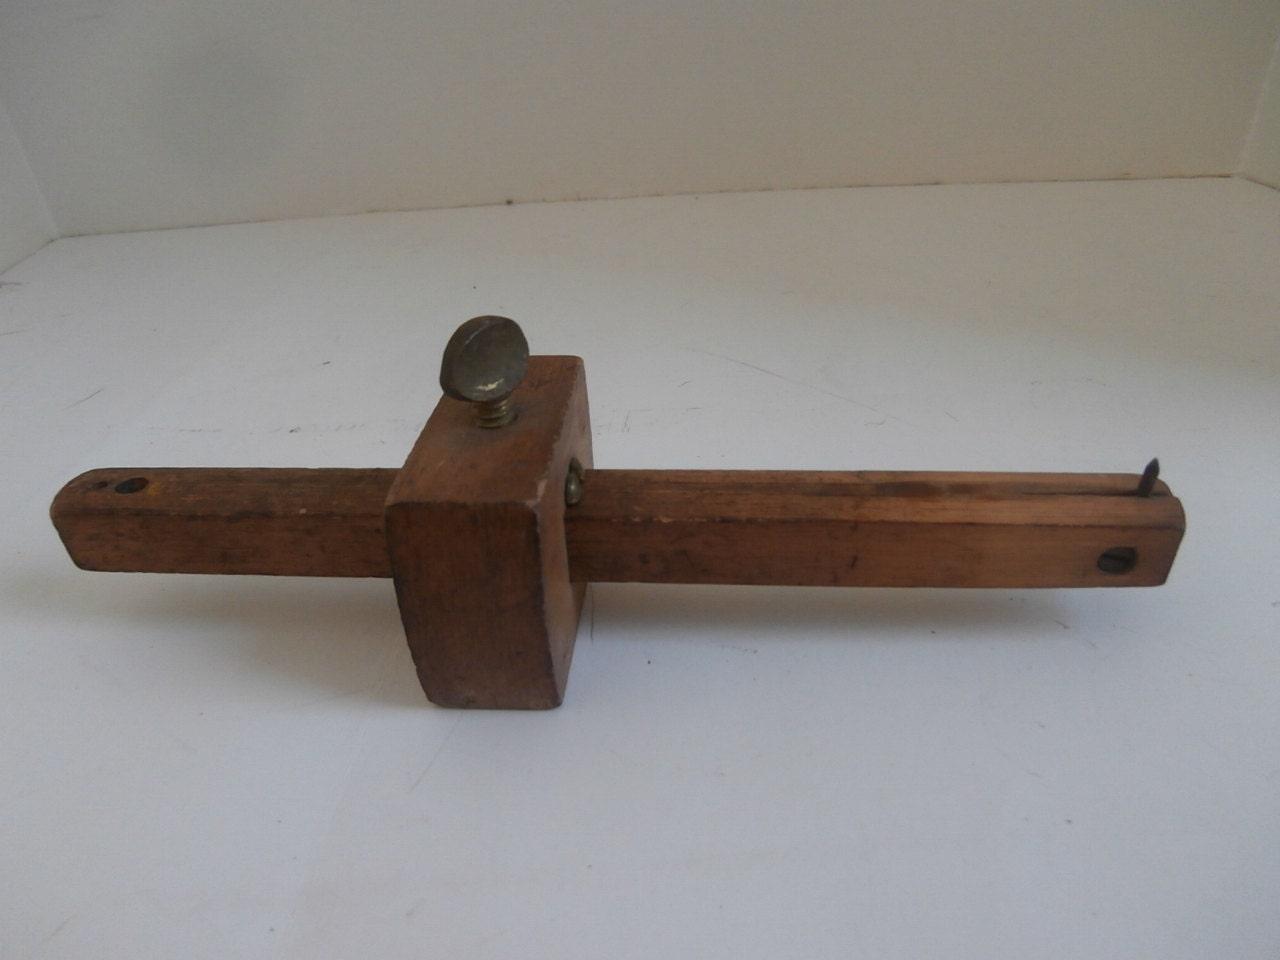 Antique Stanley Carpenter Scribe Tool Number 265 1926 to 1940 Vintage Stanley Tools